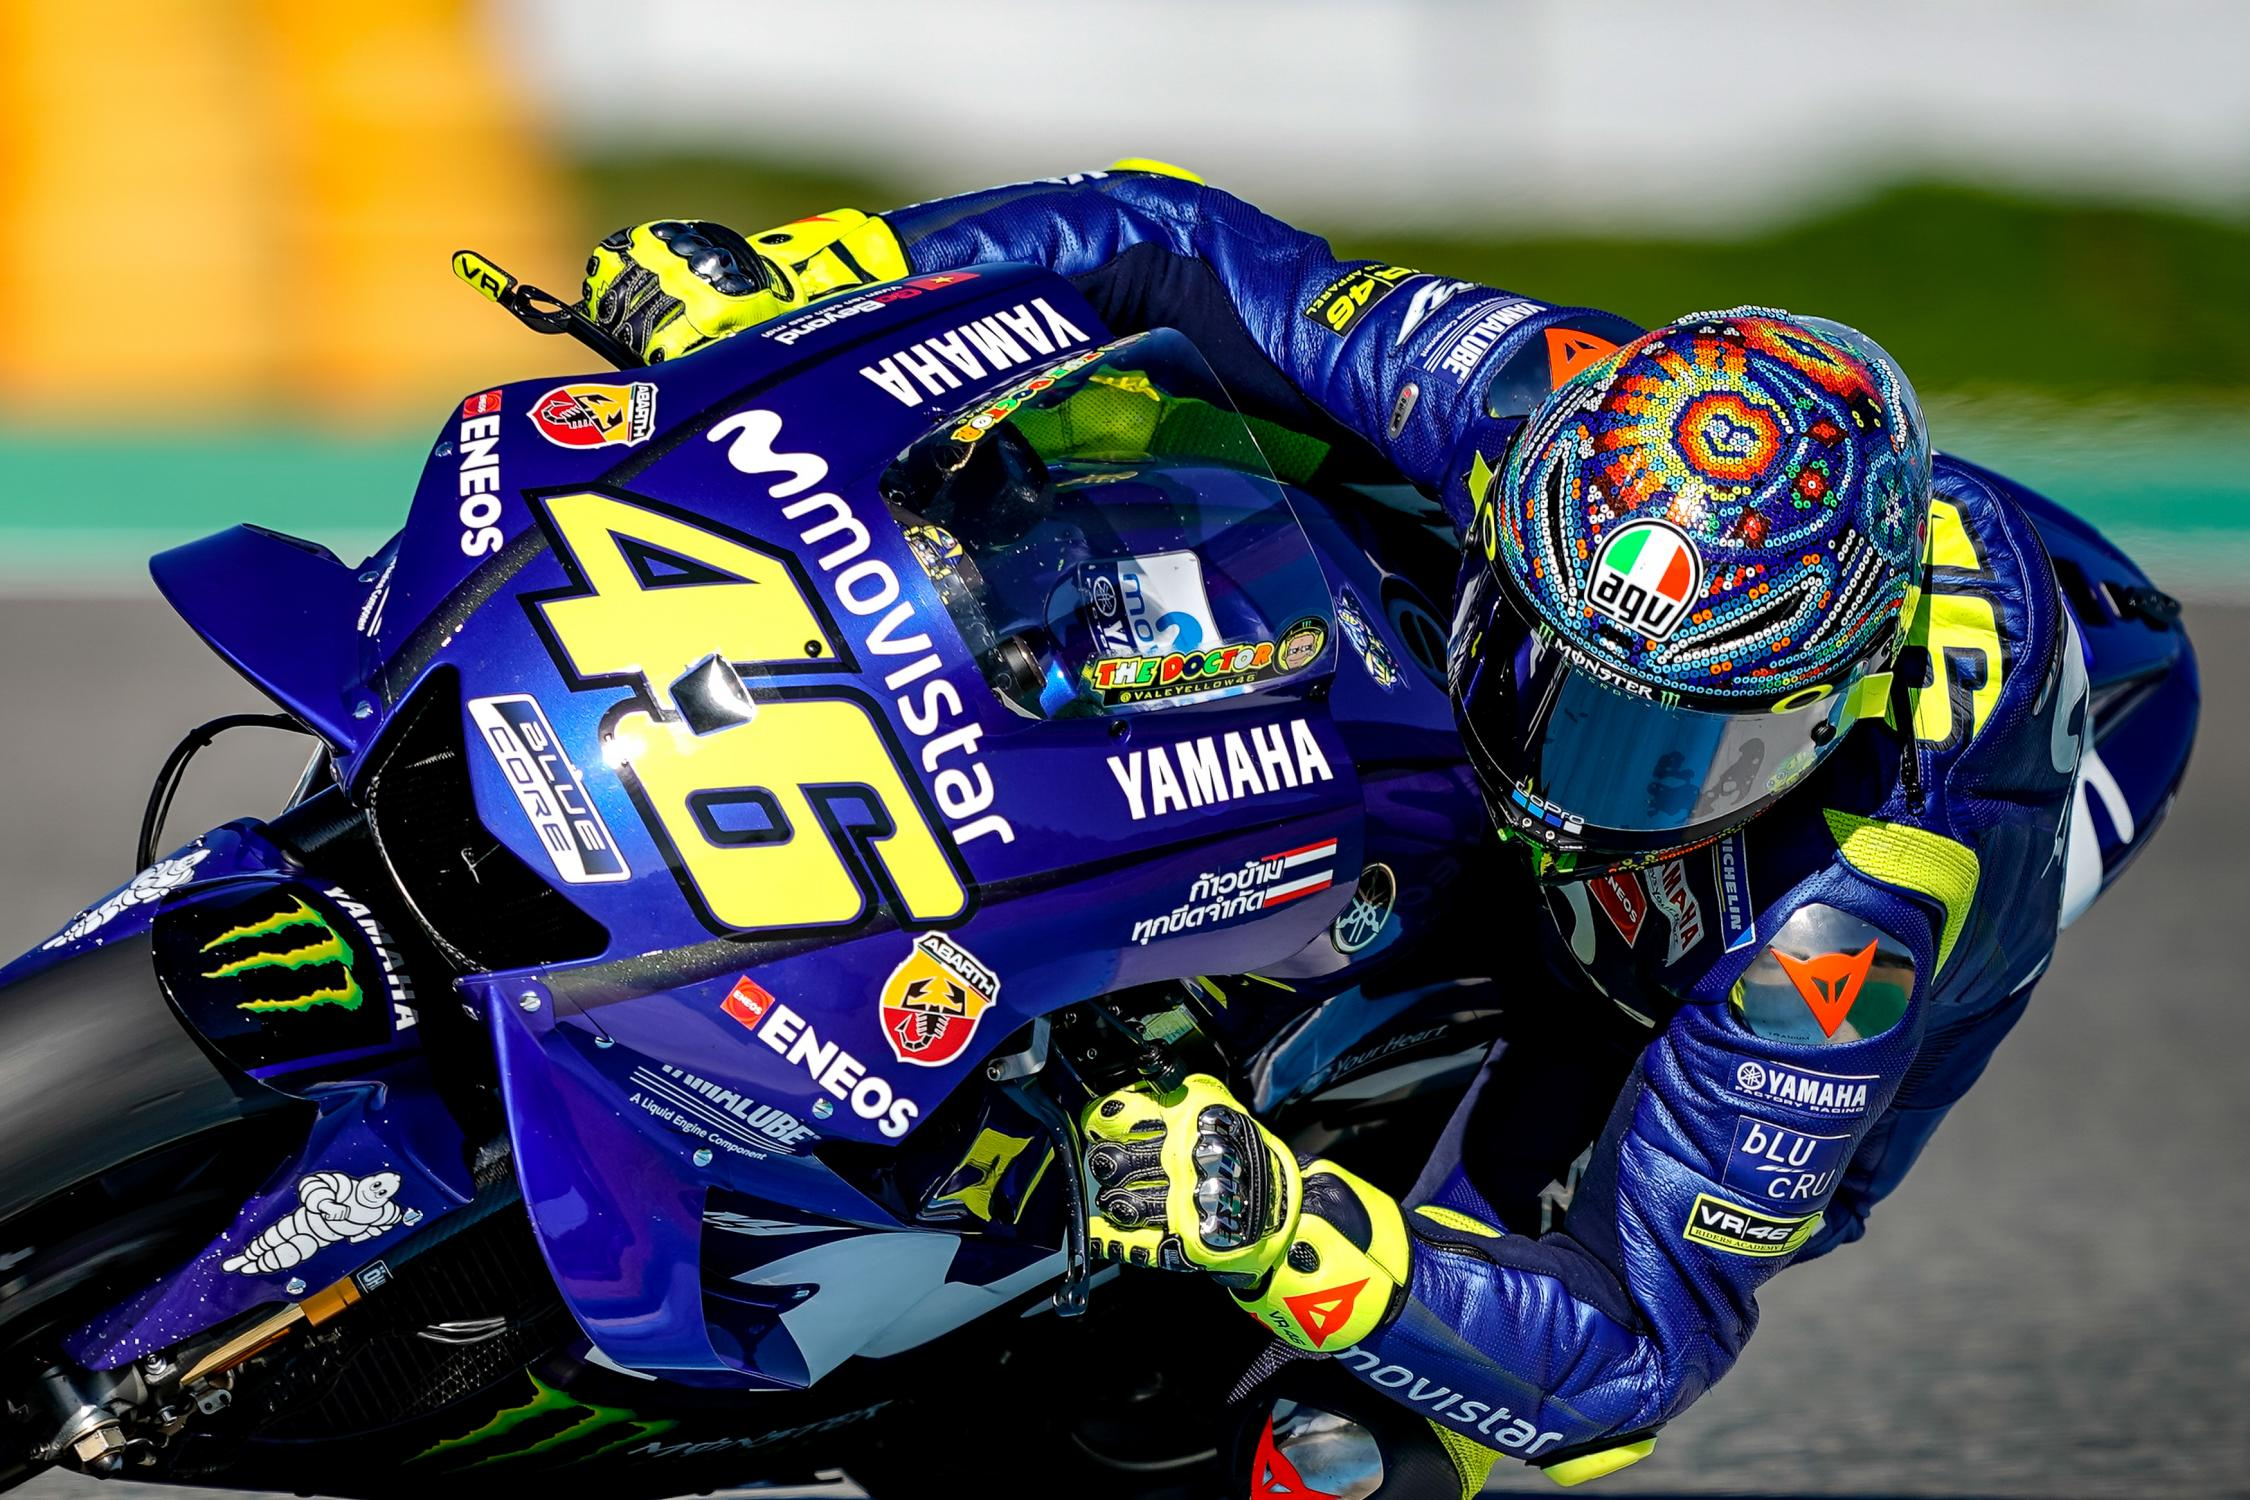 MotoGP racer on the track